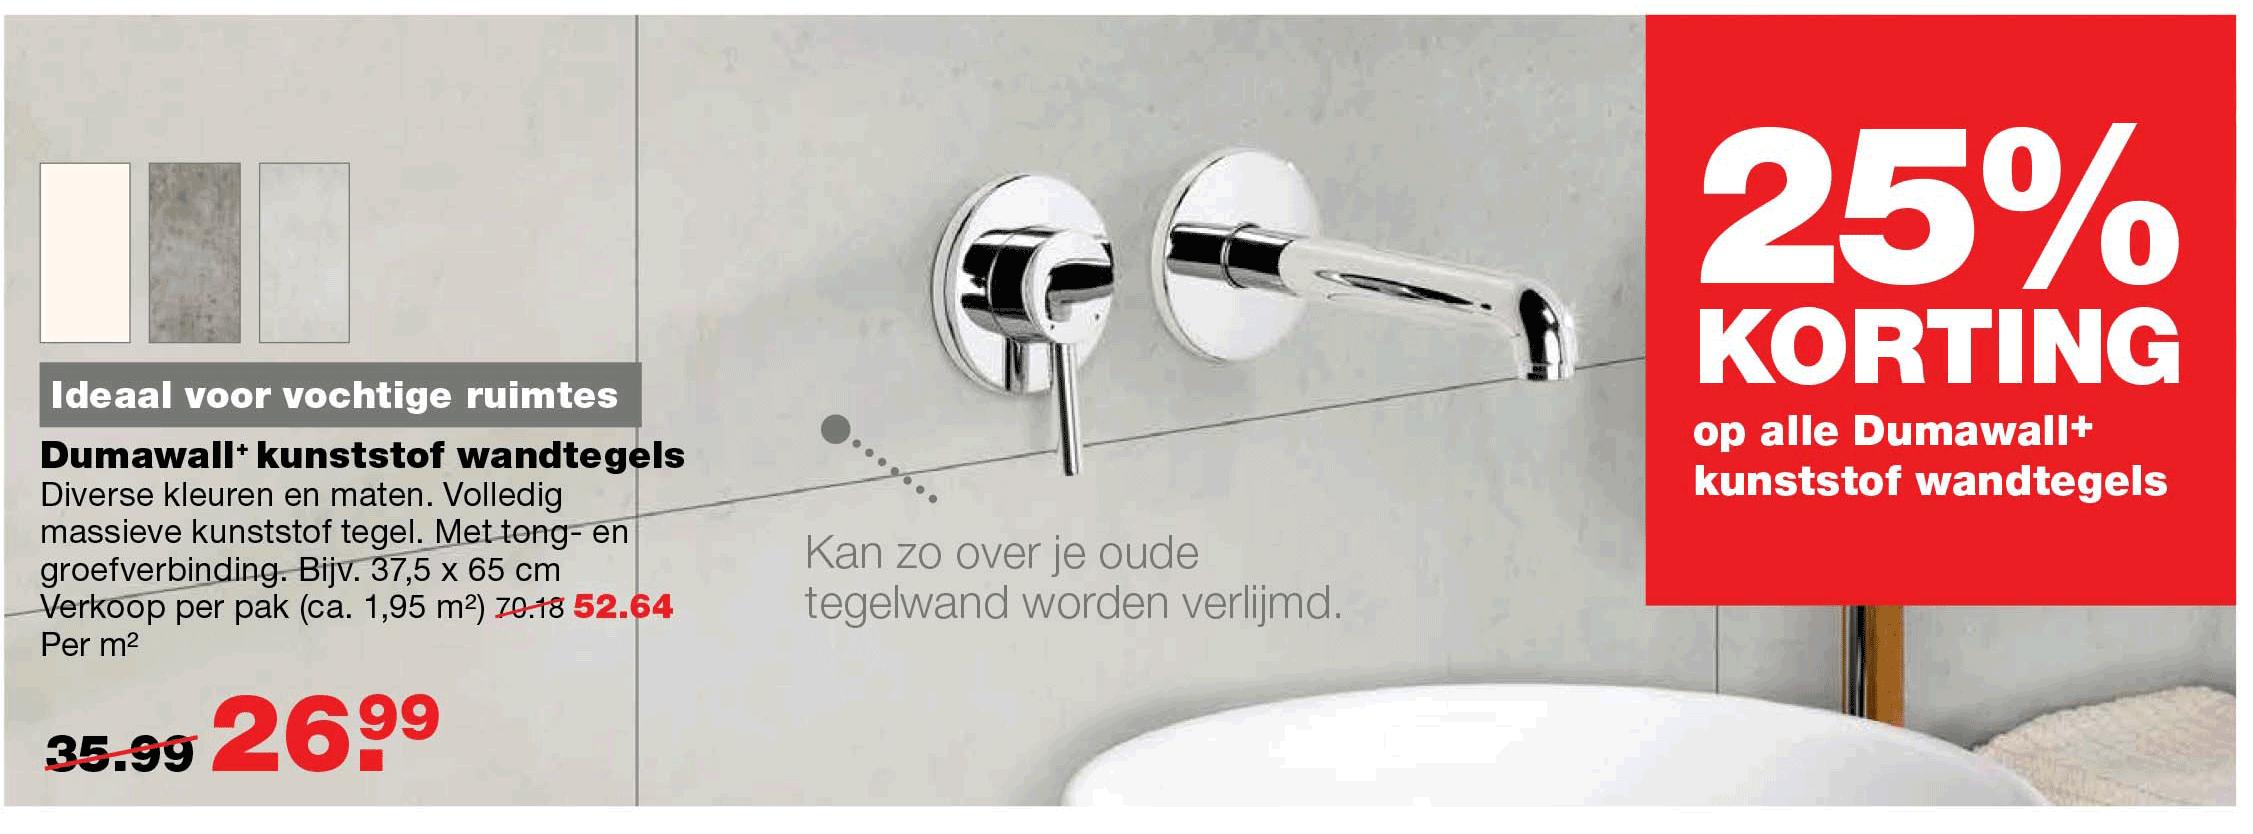 Praxis 25% Korting Op Alle Dumawall+ Kunststof Wandtegels